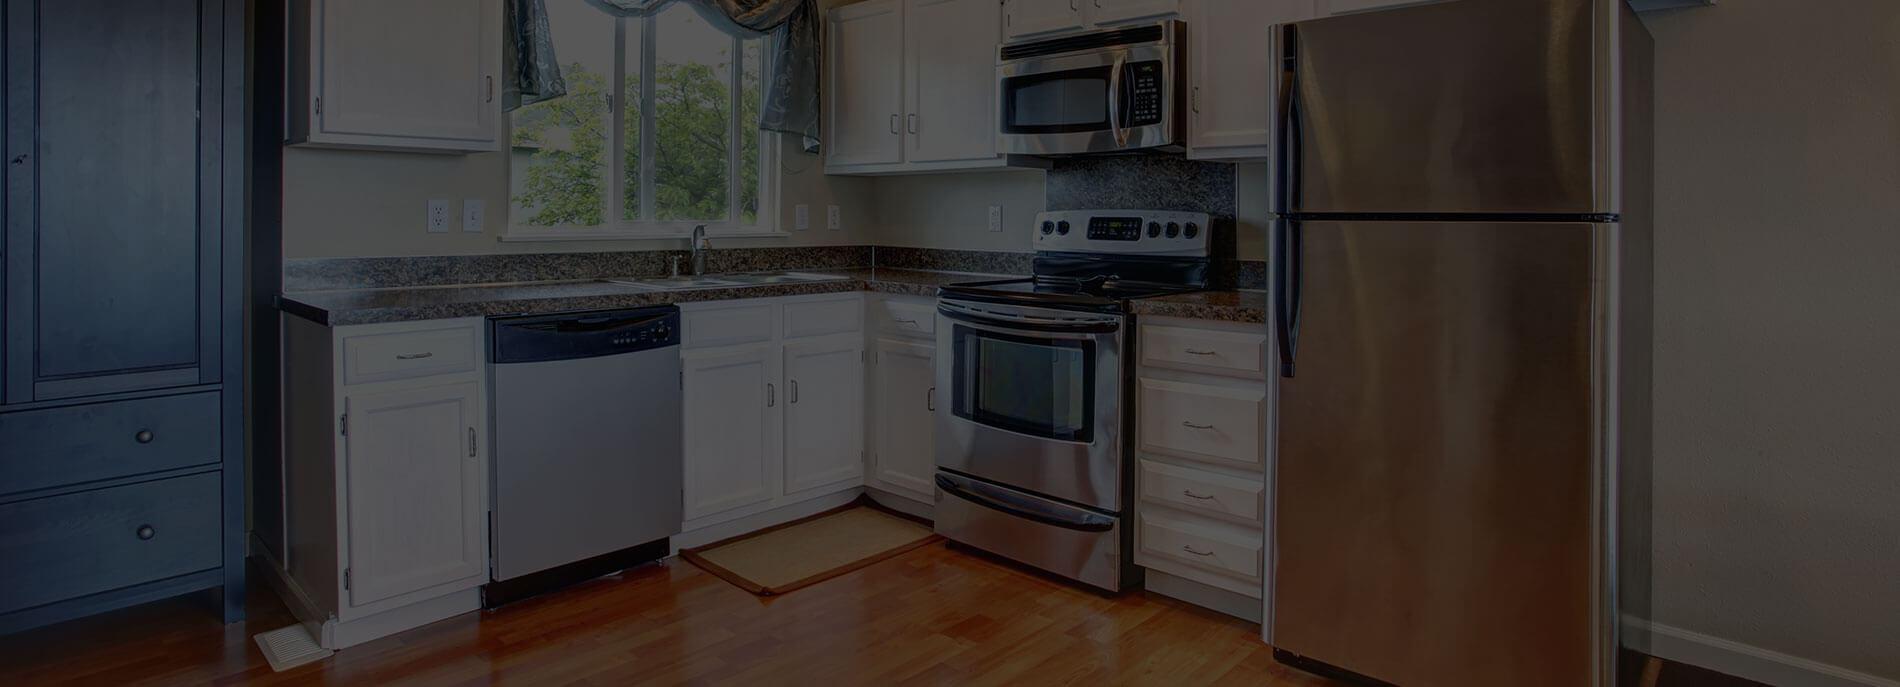 Atlas Appliance Repairs